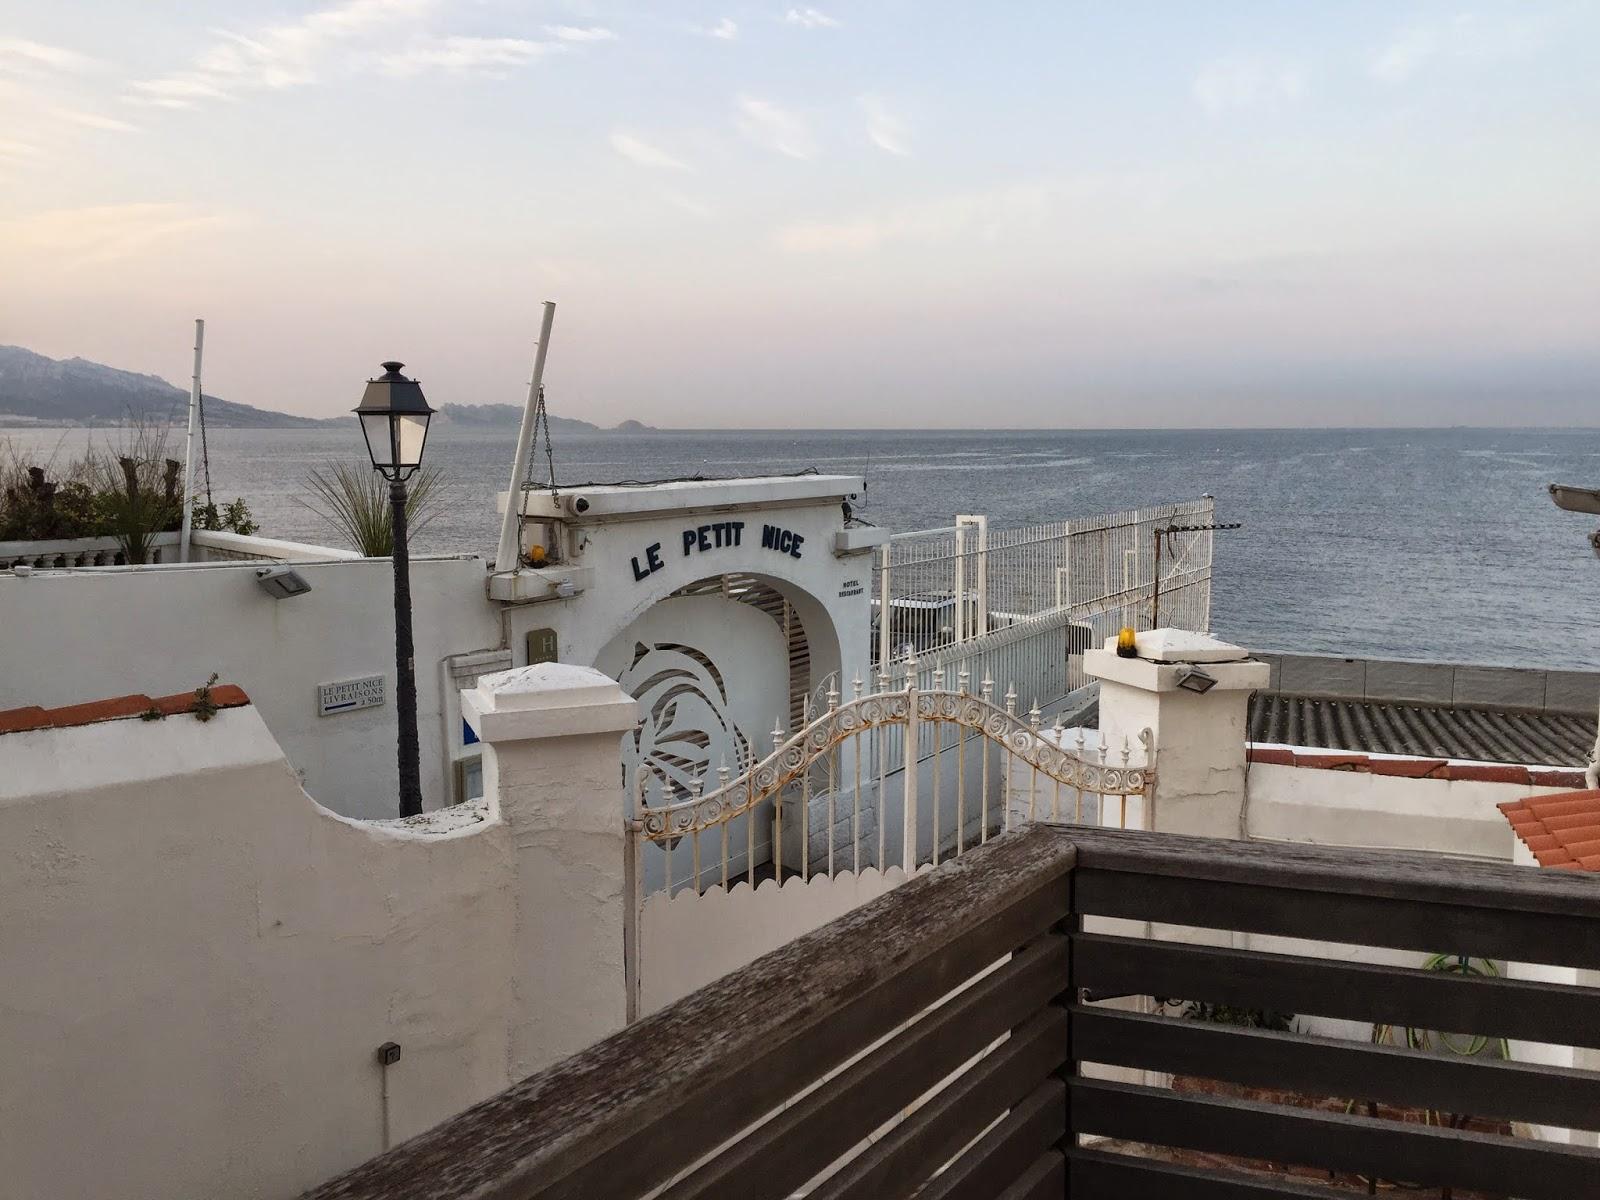 Le Petit Nice Marseille